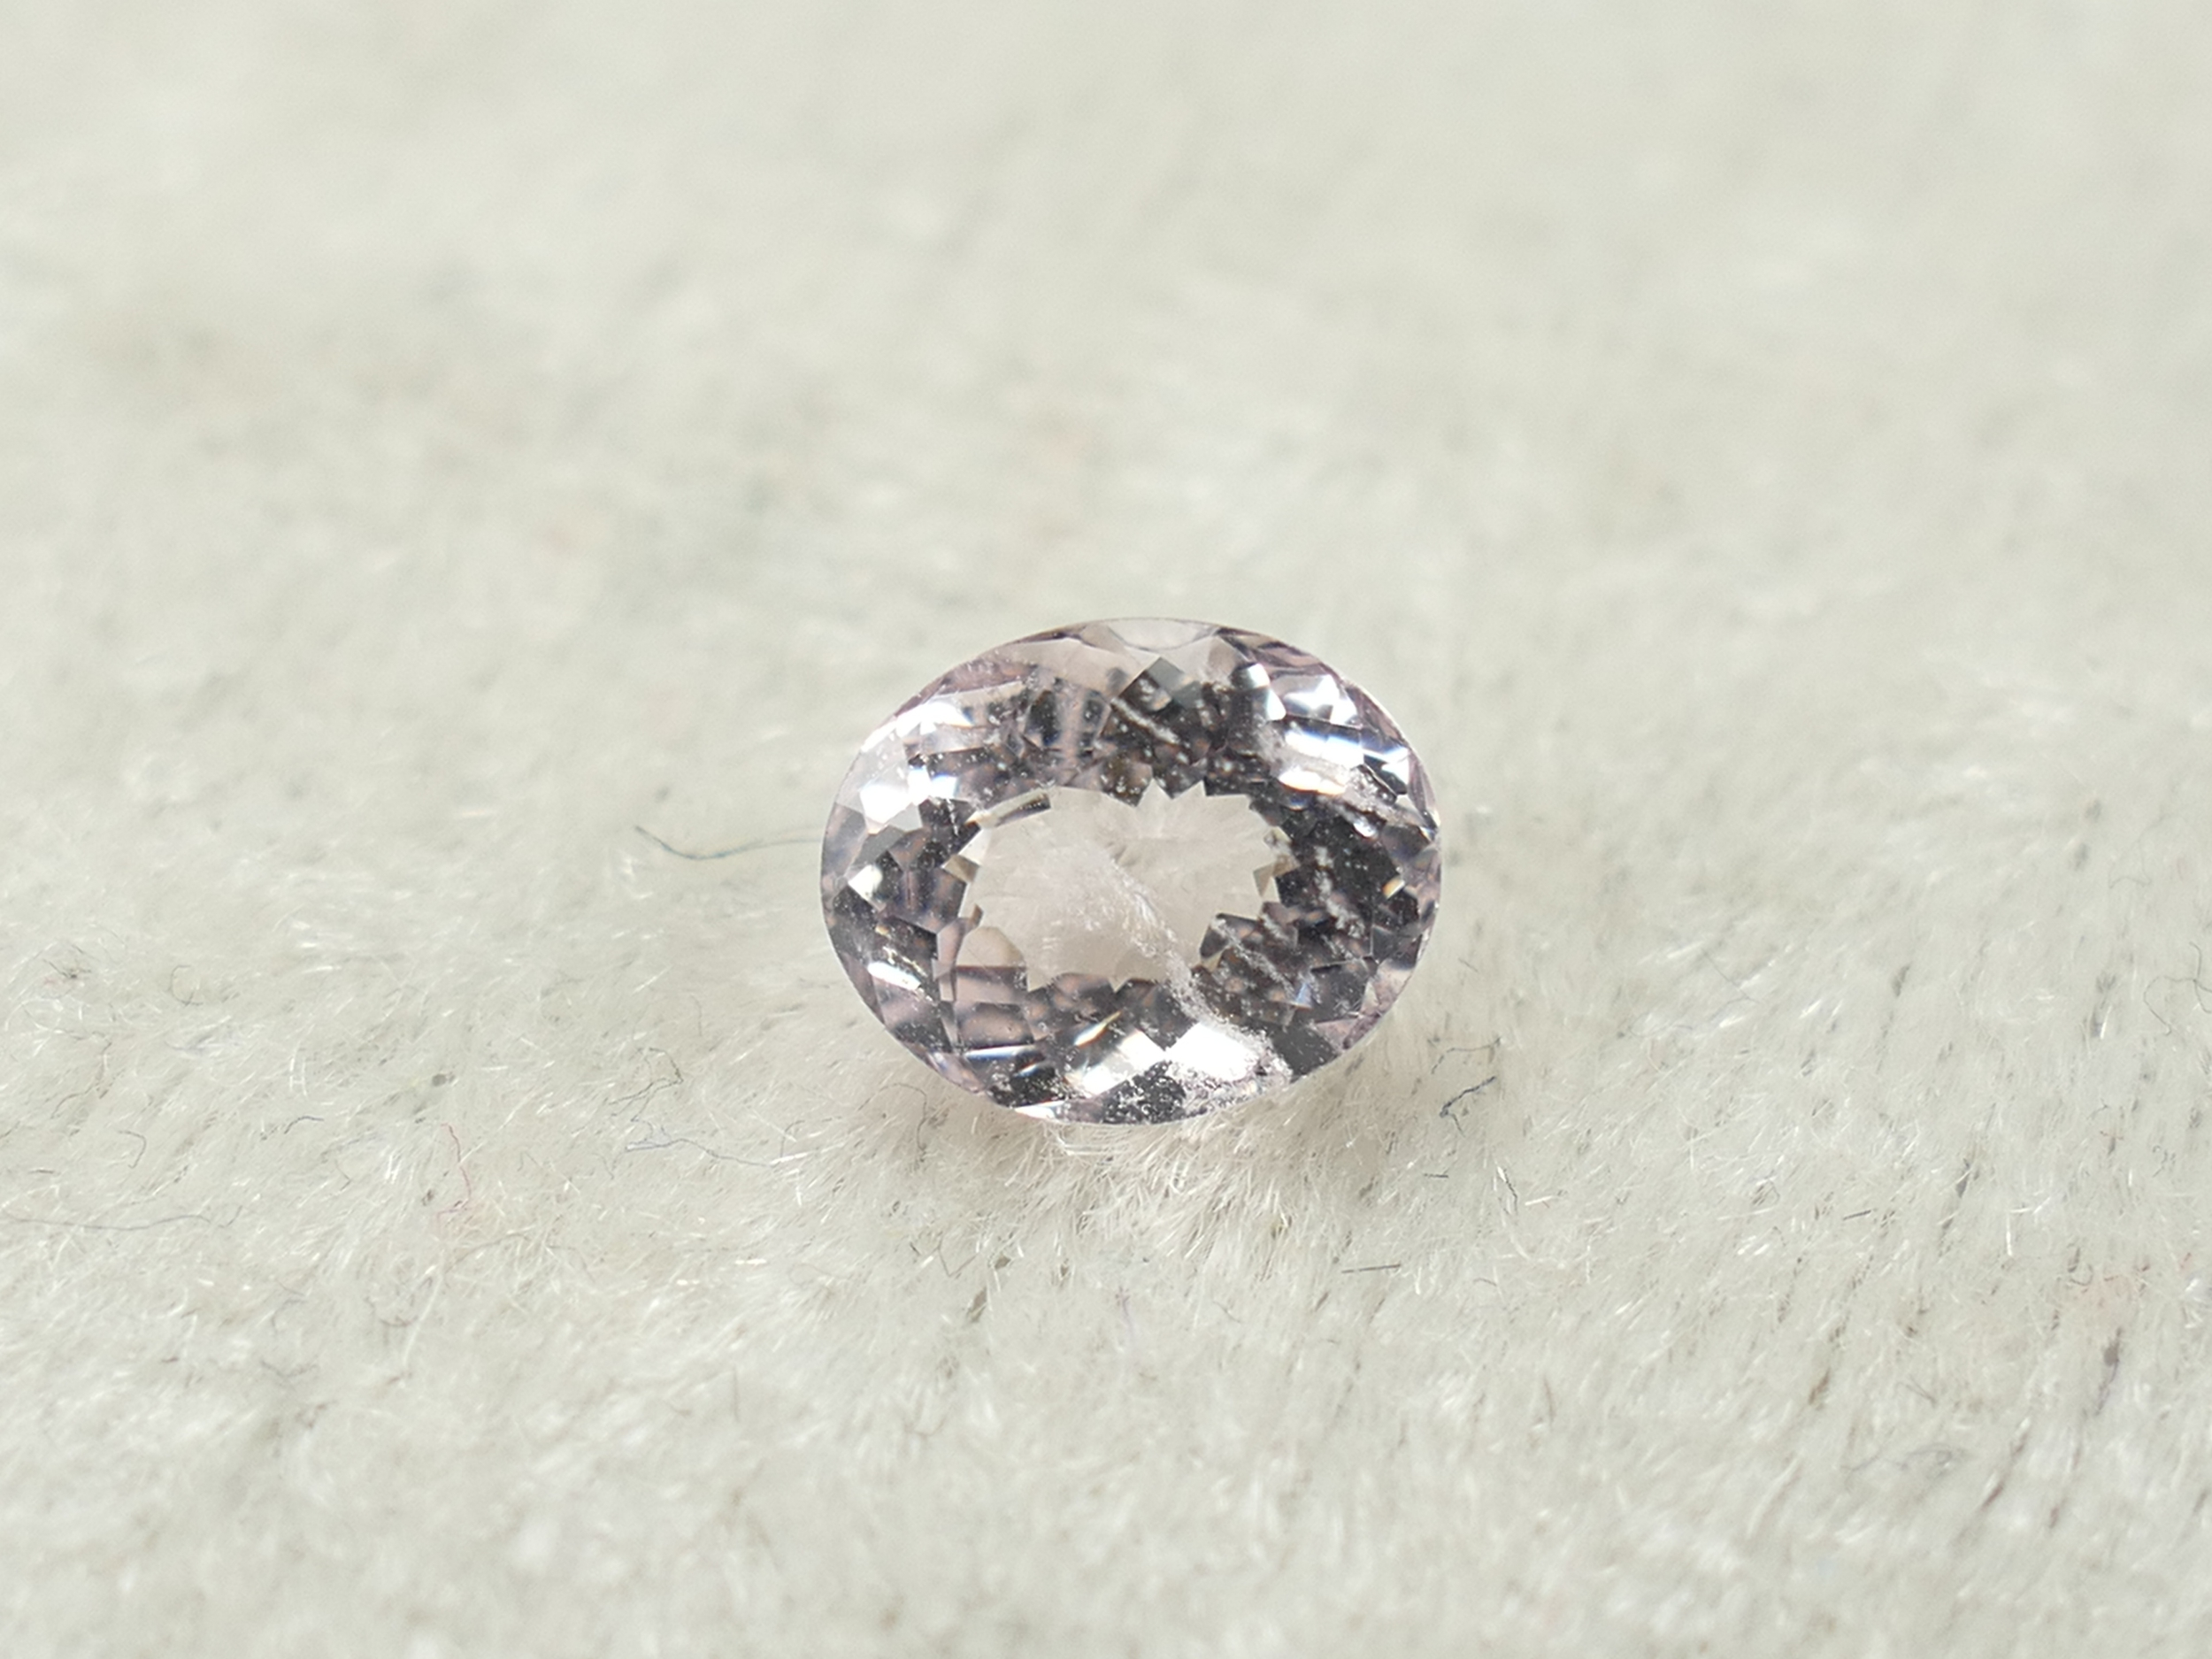 6.8x5.5mm Morganite Béryl rose entièrement naturelle ovale 0.89ct Namibie (#PK516)